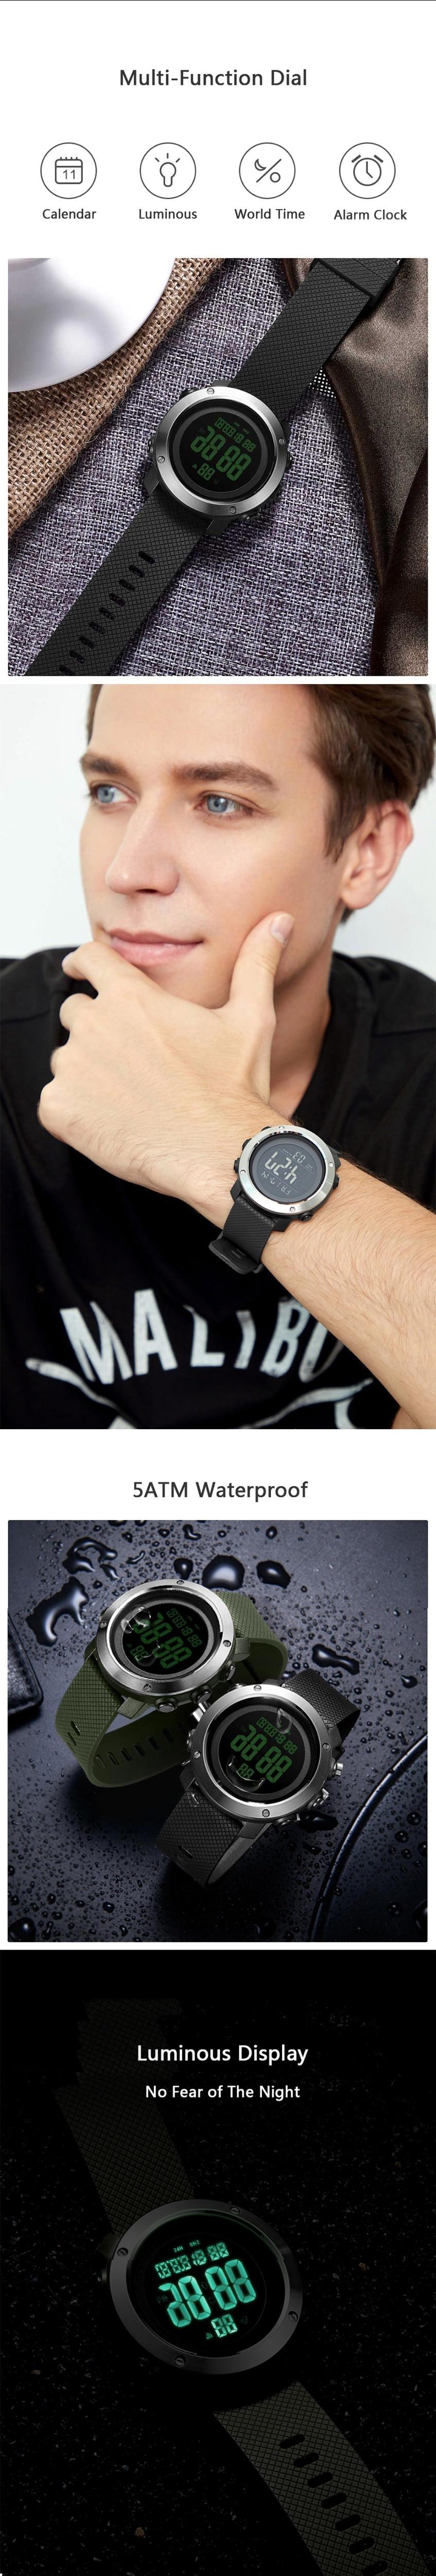 Xiaomi ALIFIT Digital Watches Multifunctional Outdoor Waterproof Noctilucent Display Calender Alarm Countdown Sports Watch (1)